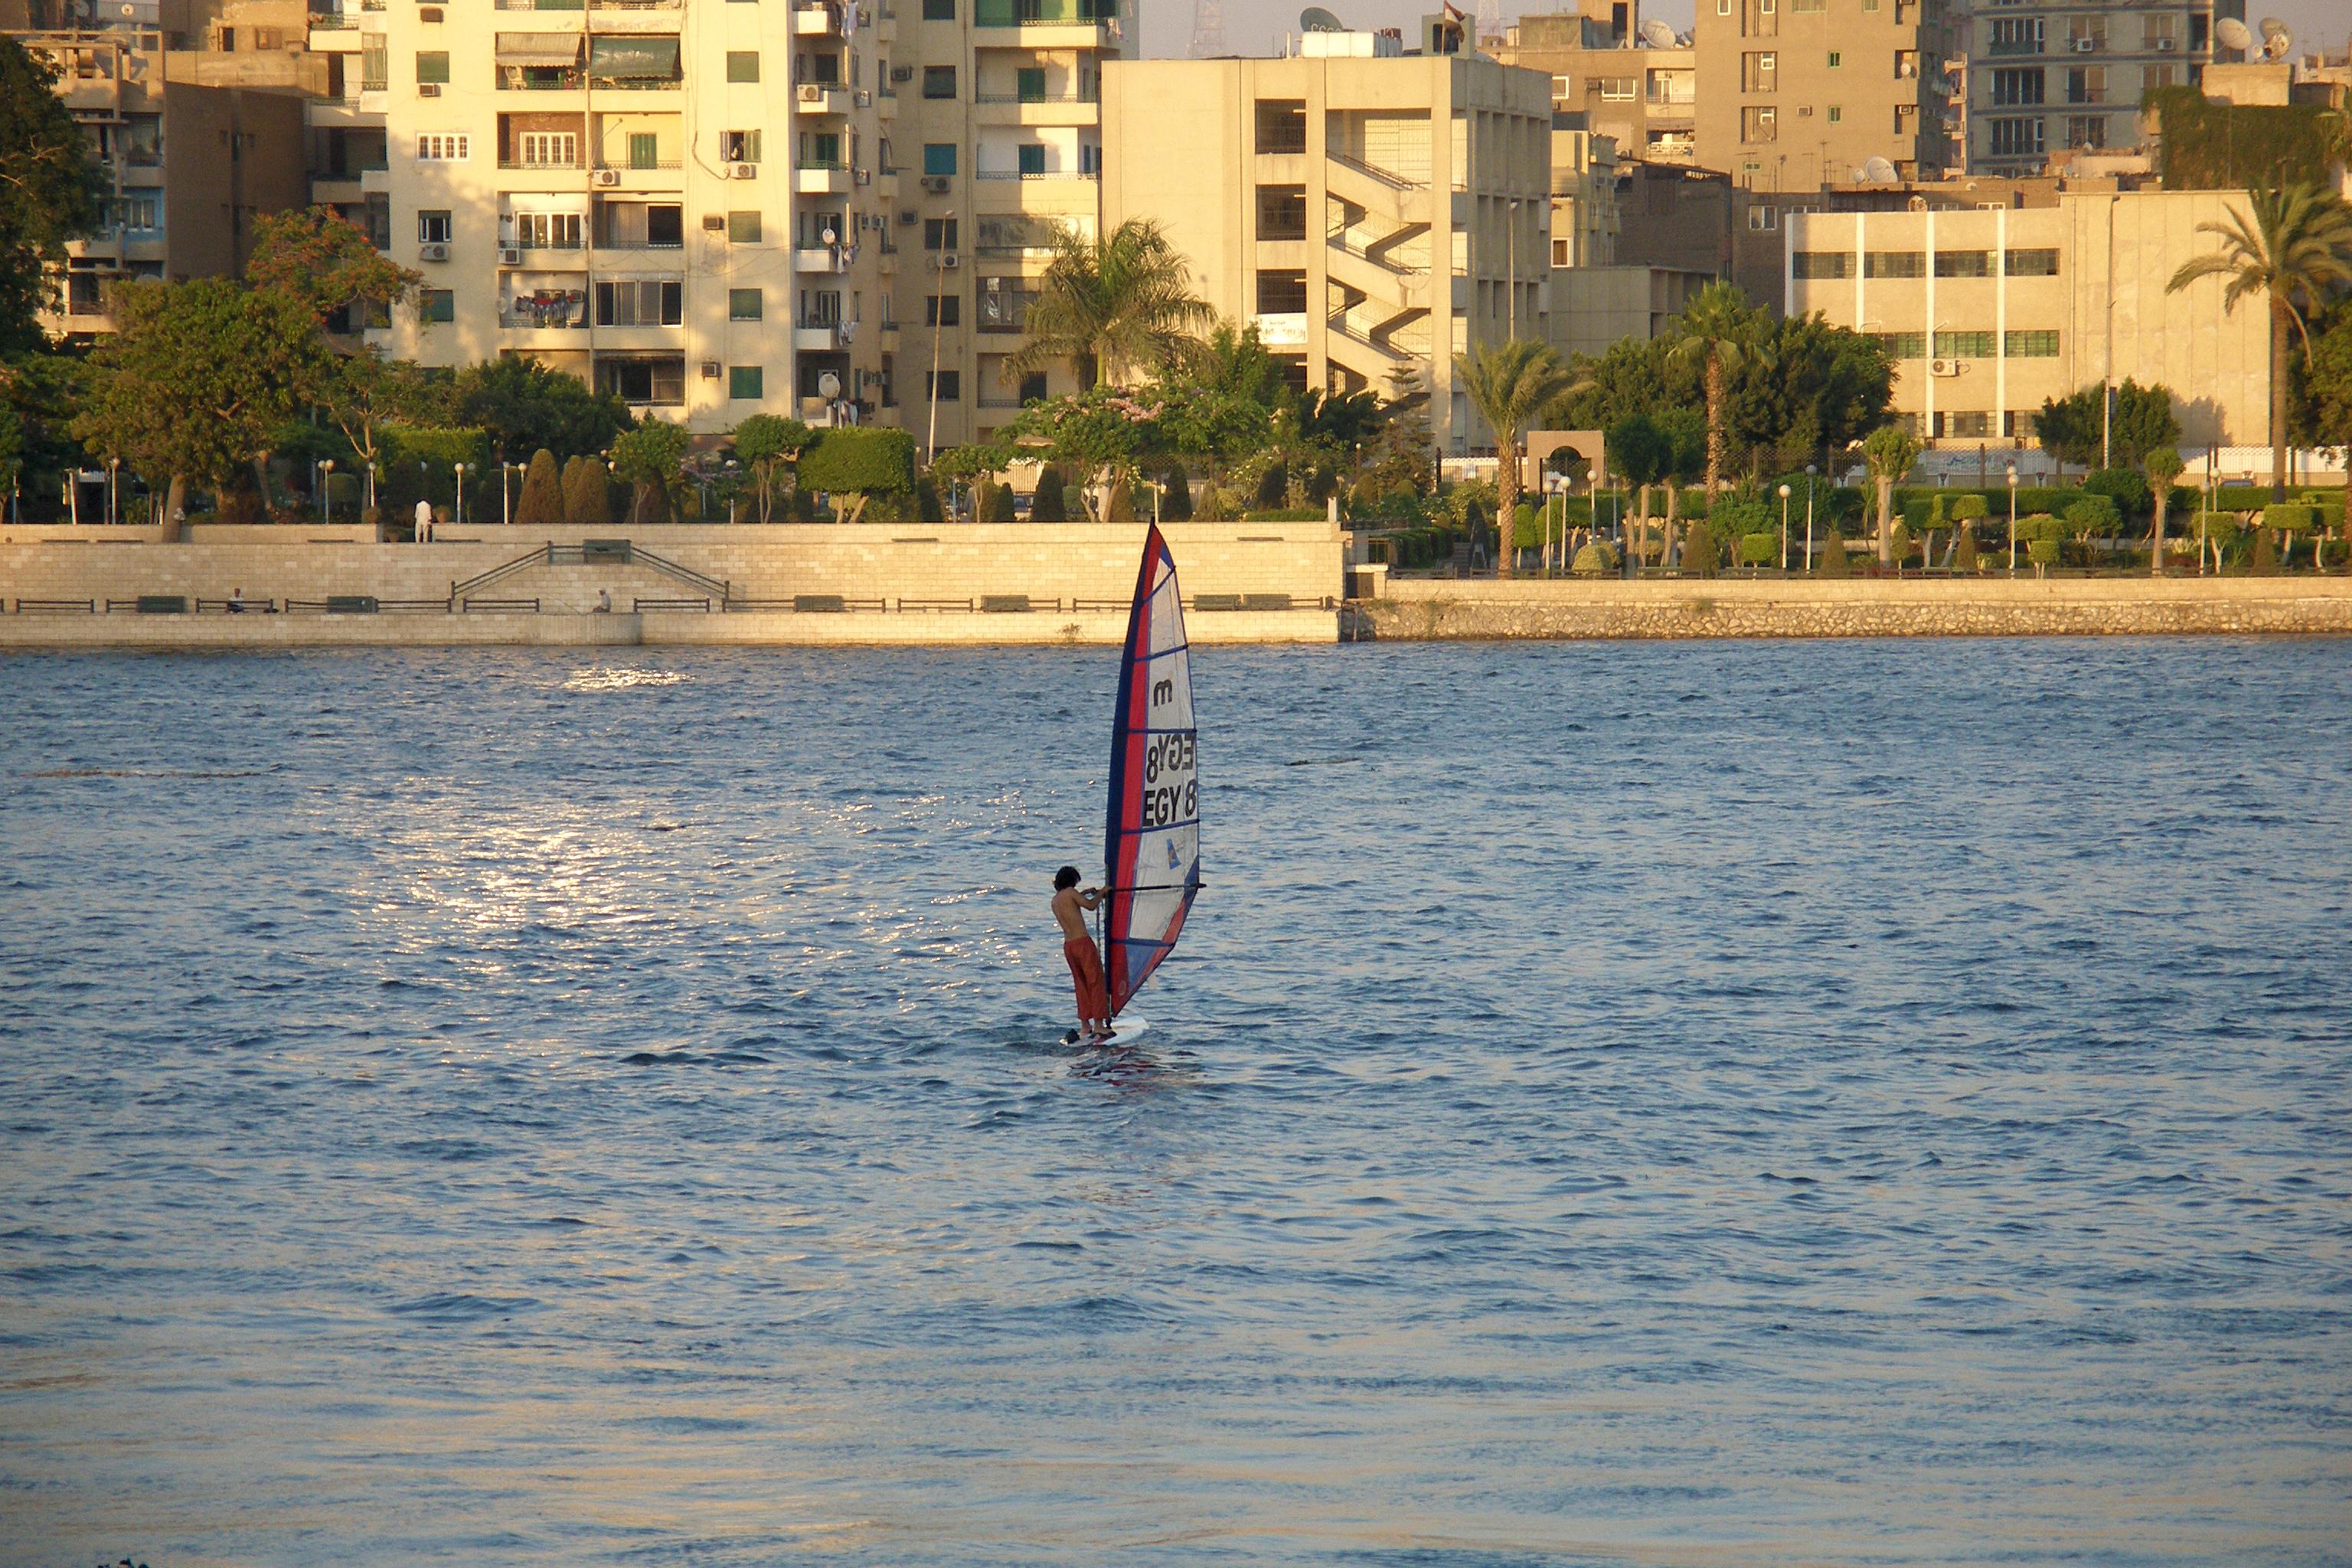 File:Egypt, Cairo, Windsurfing on Nile River.jpg - Wikimedia Commons